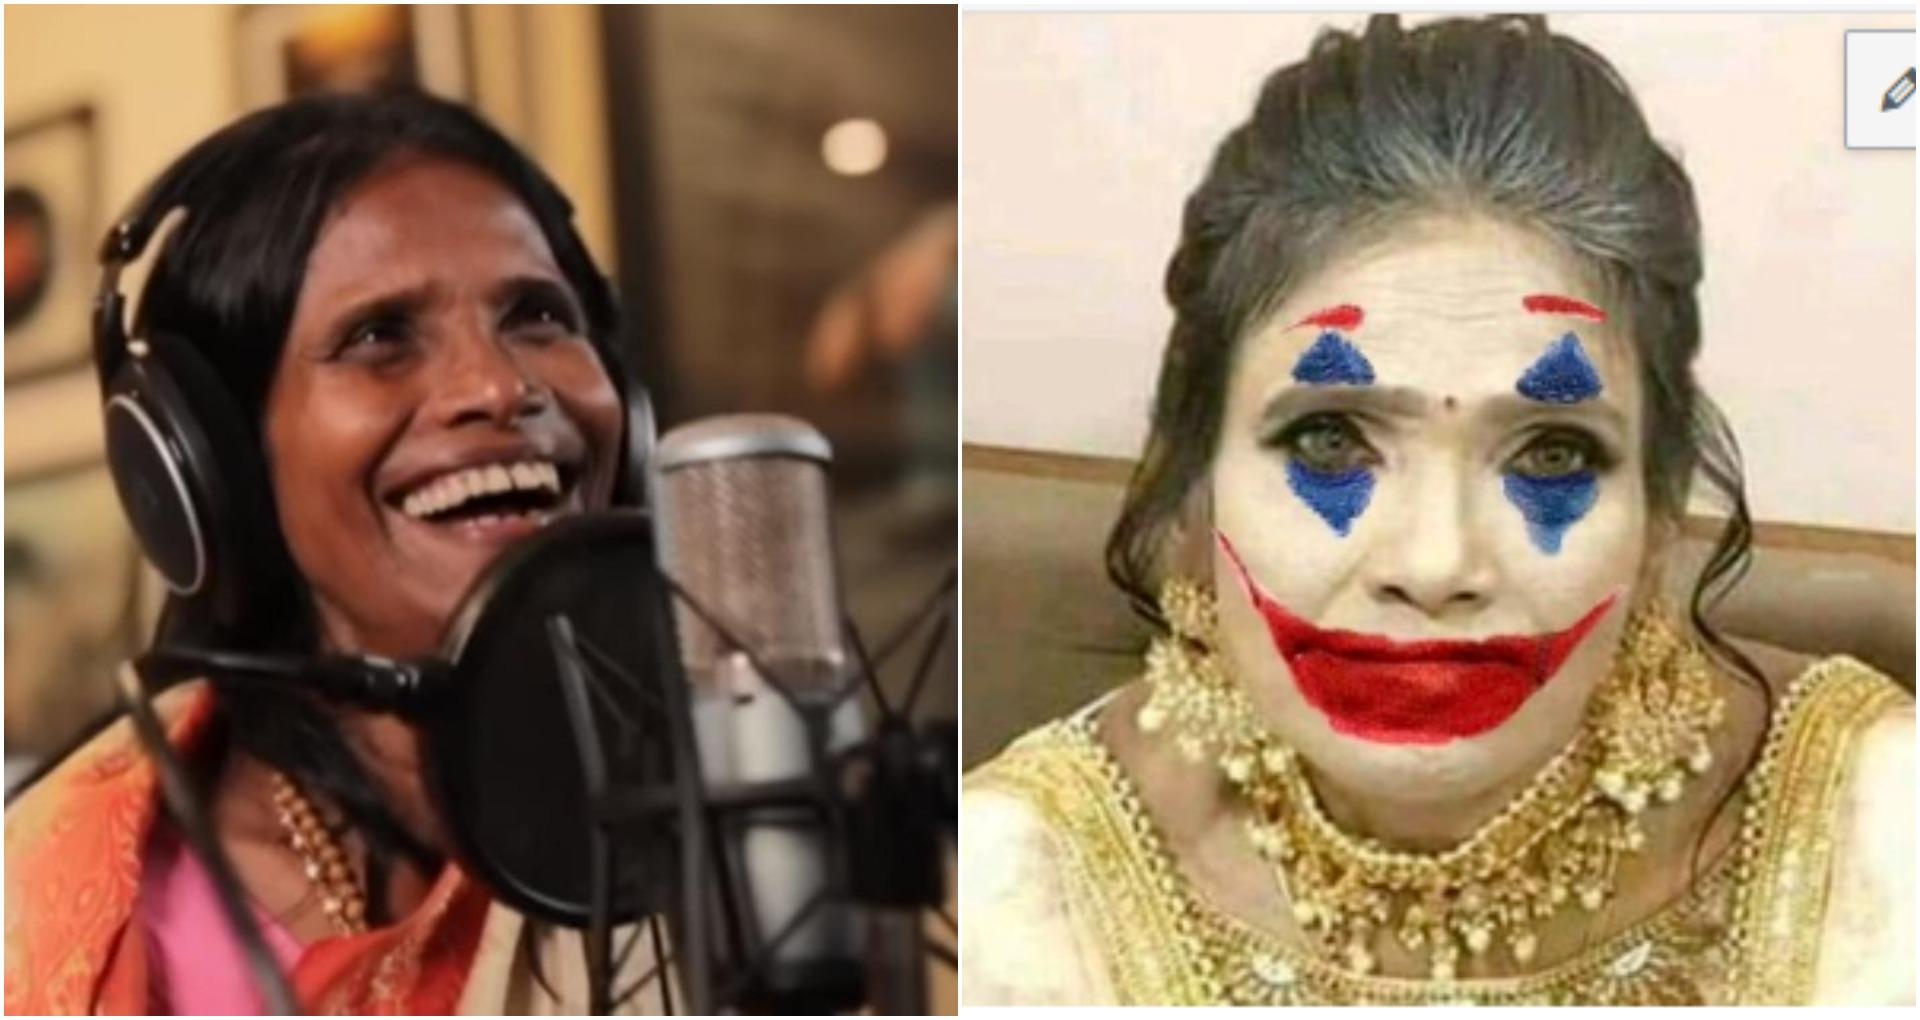 सलमान खान को पीछे छोड़ने वाली रानू मंडल का बढ़ा भाव, पढ़े स्पेशल रिपोर्ट